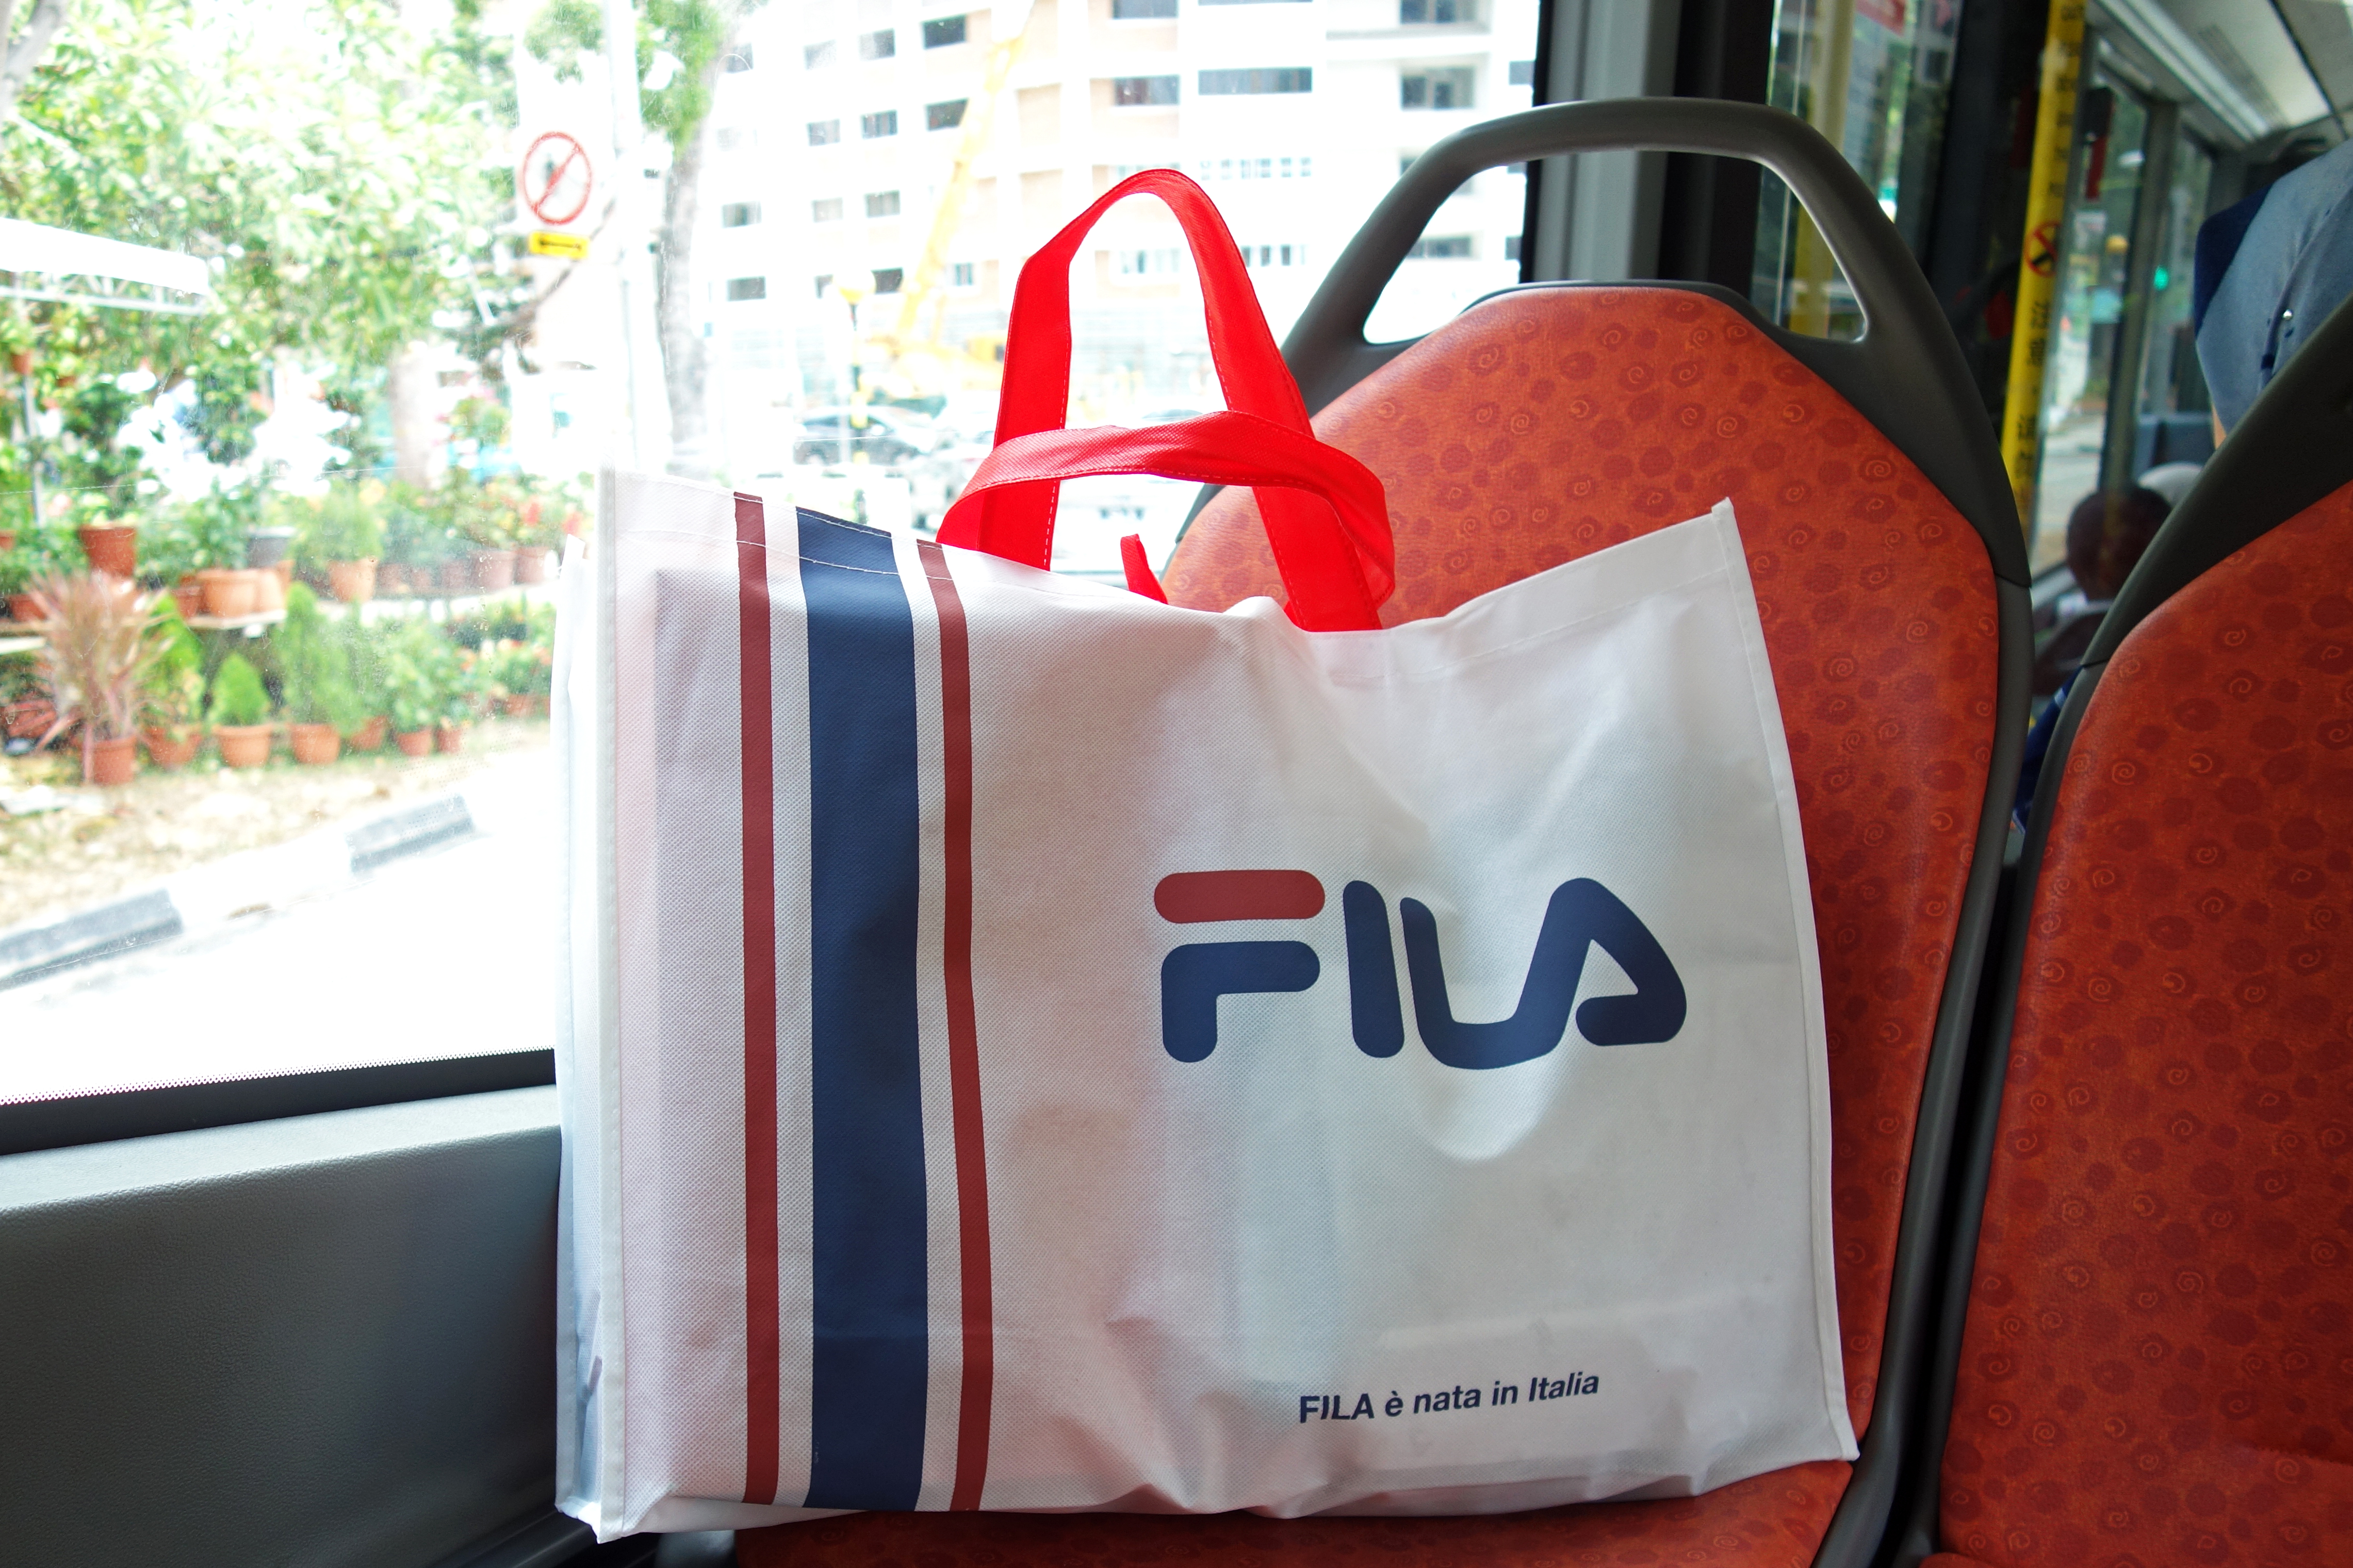 Fila shopping bag.jpg